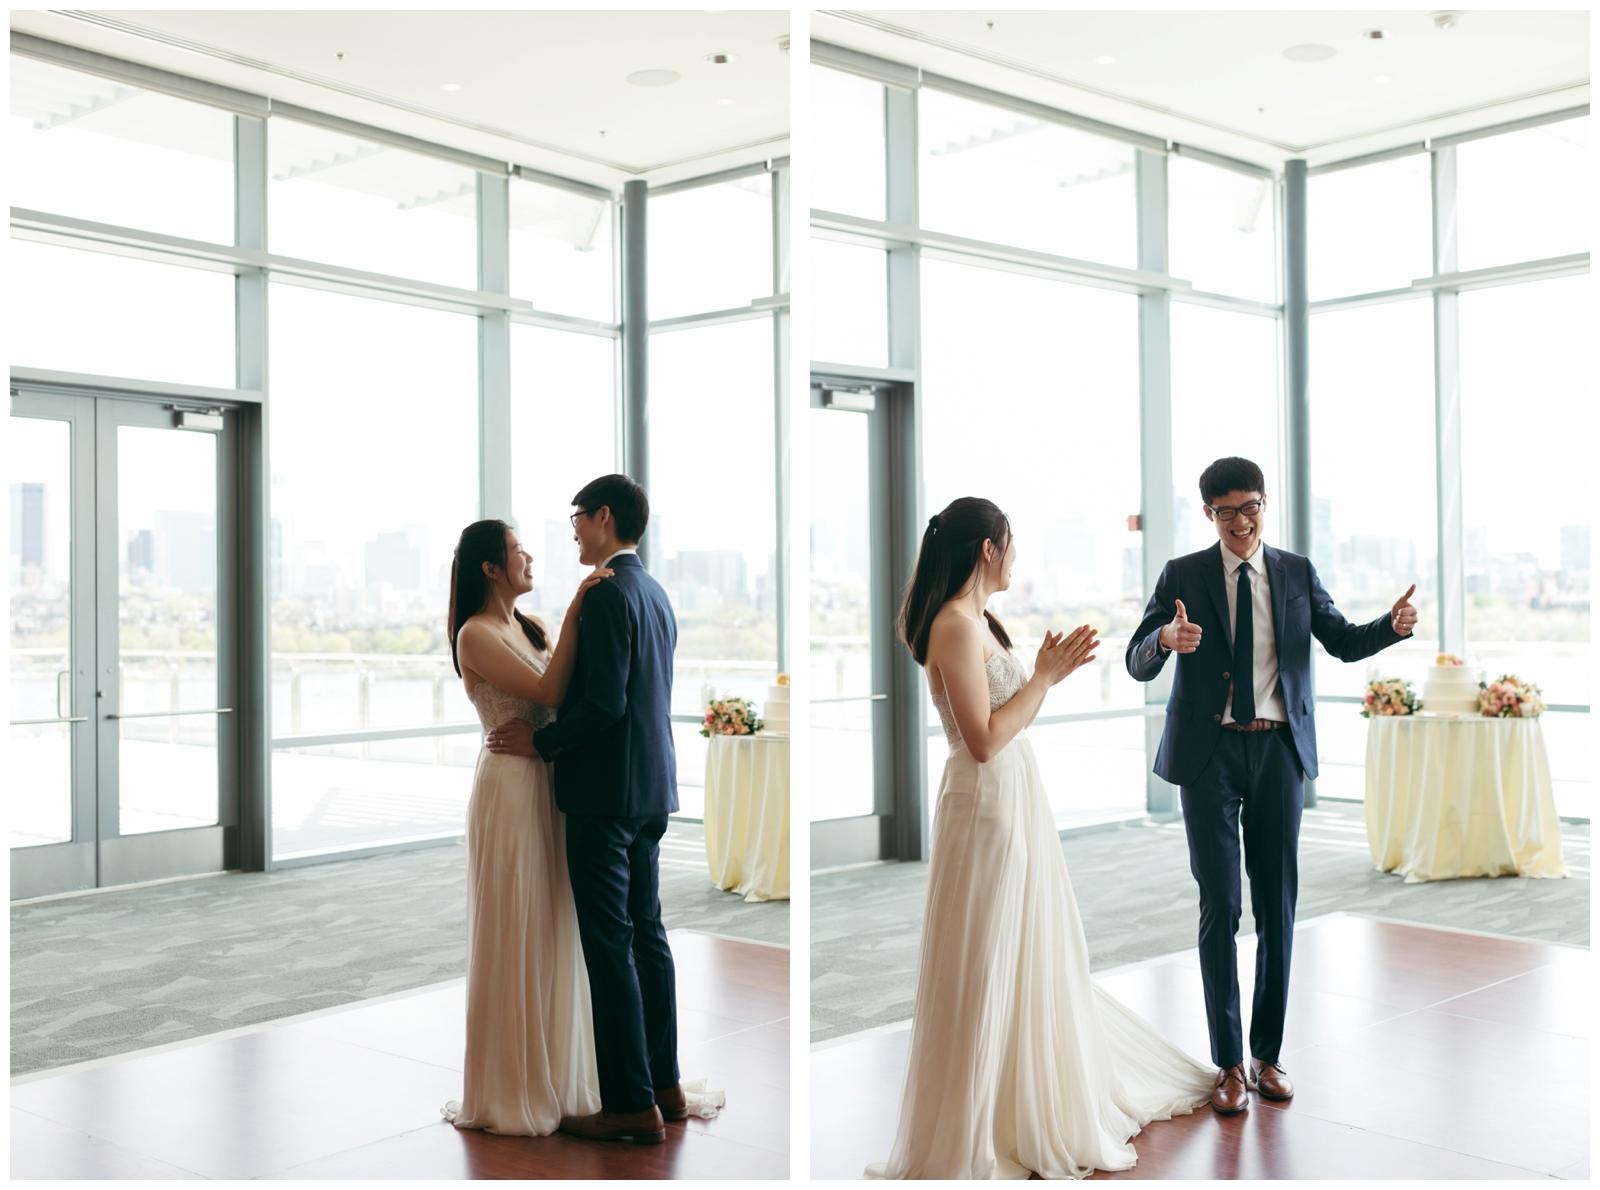 Samberg-Conference-Center-Boston-Wedding-Photographer-Bailey-Q-Photo-098.jpg